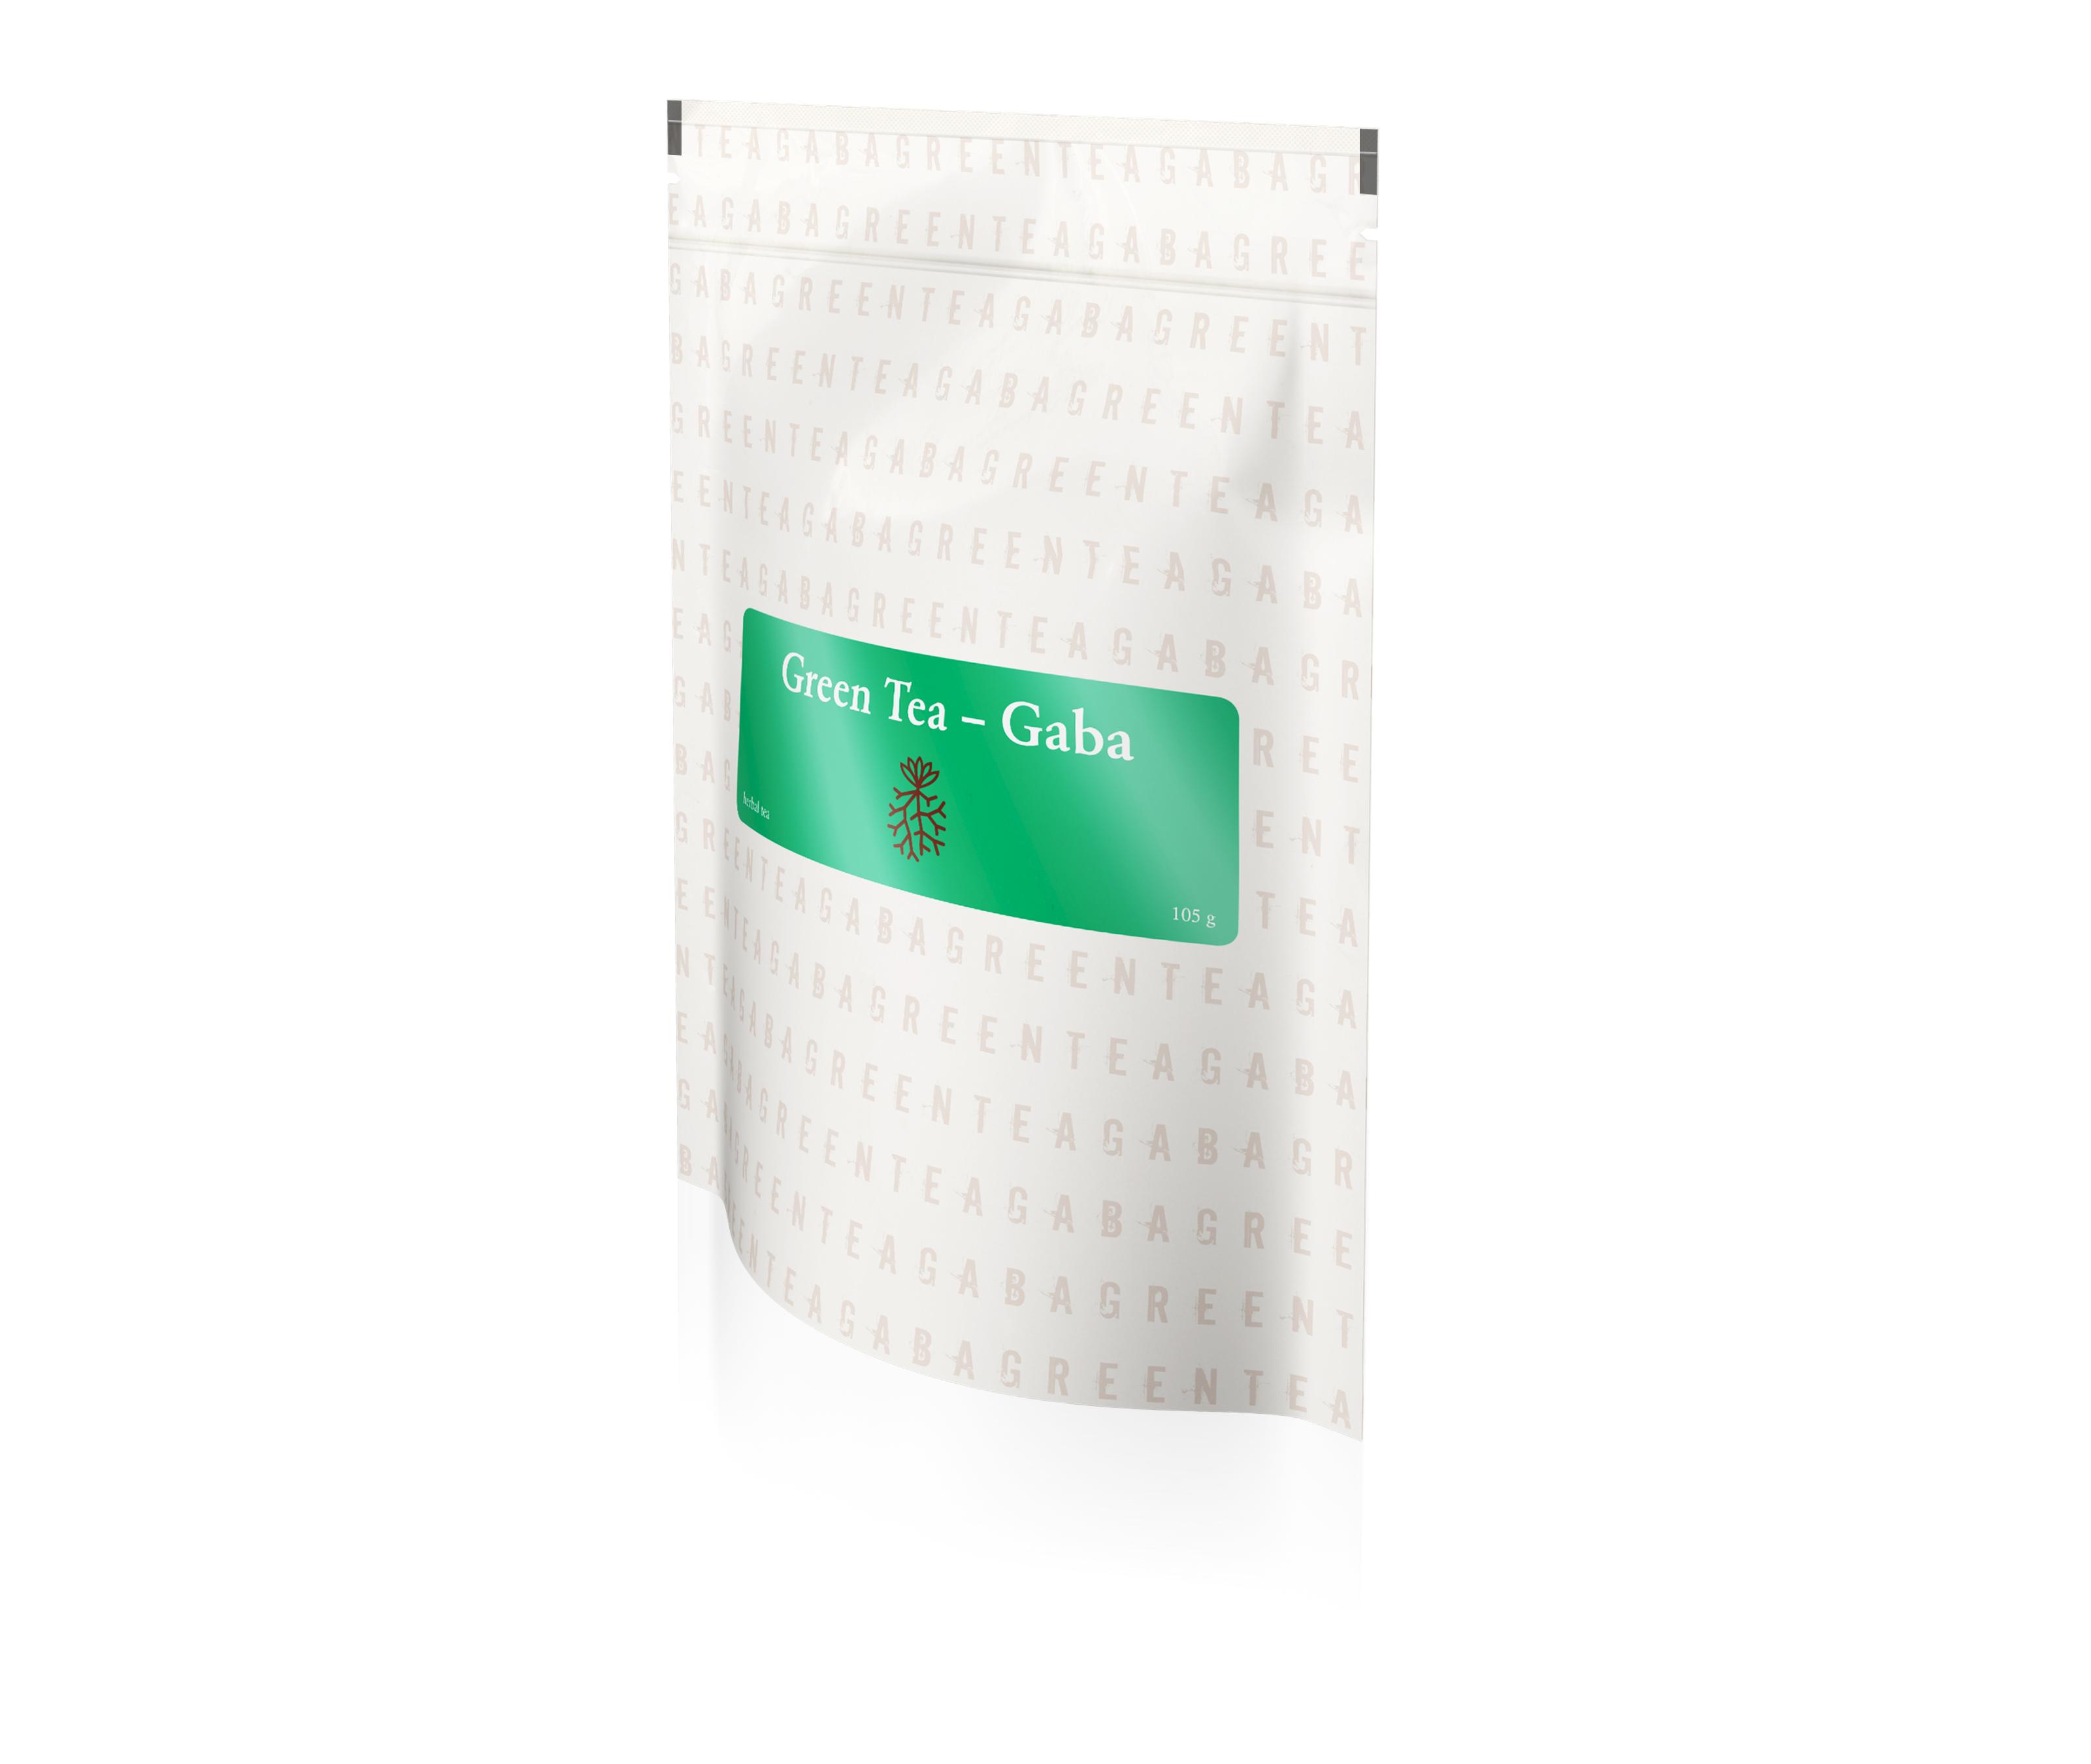 Green_Tea_GABA_3D_300dpi